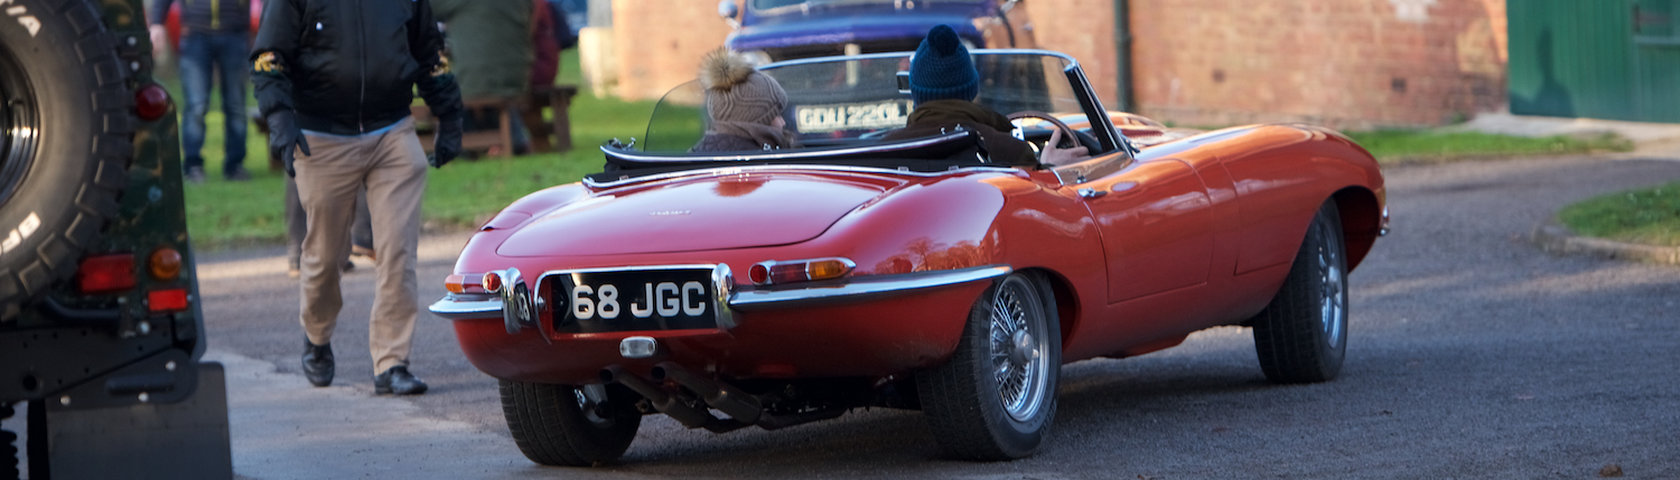 Nsh Jaguar Sunday Scramble 15